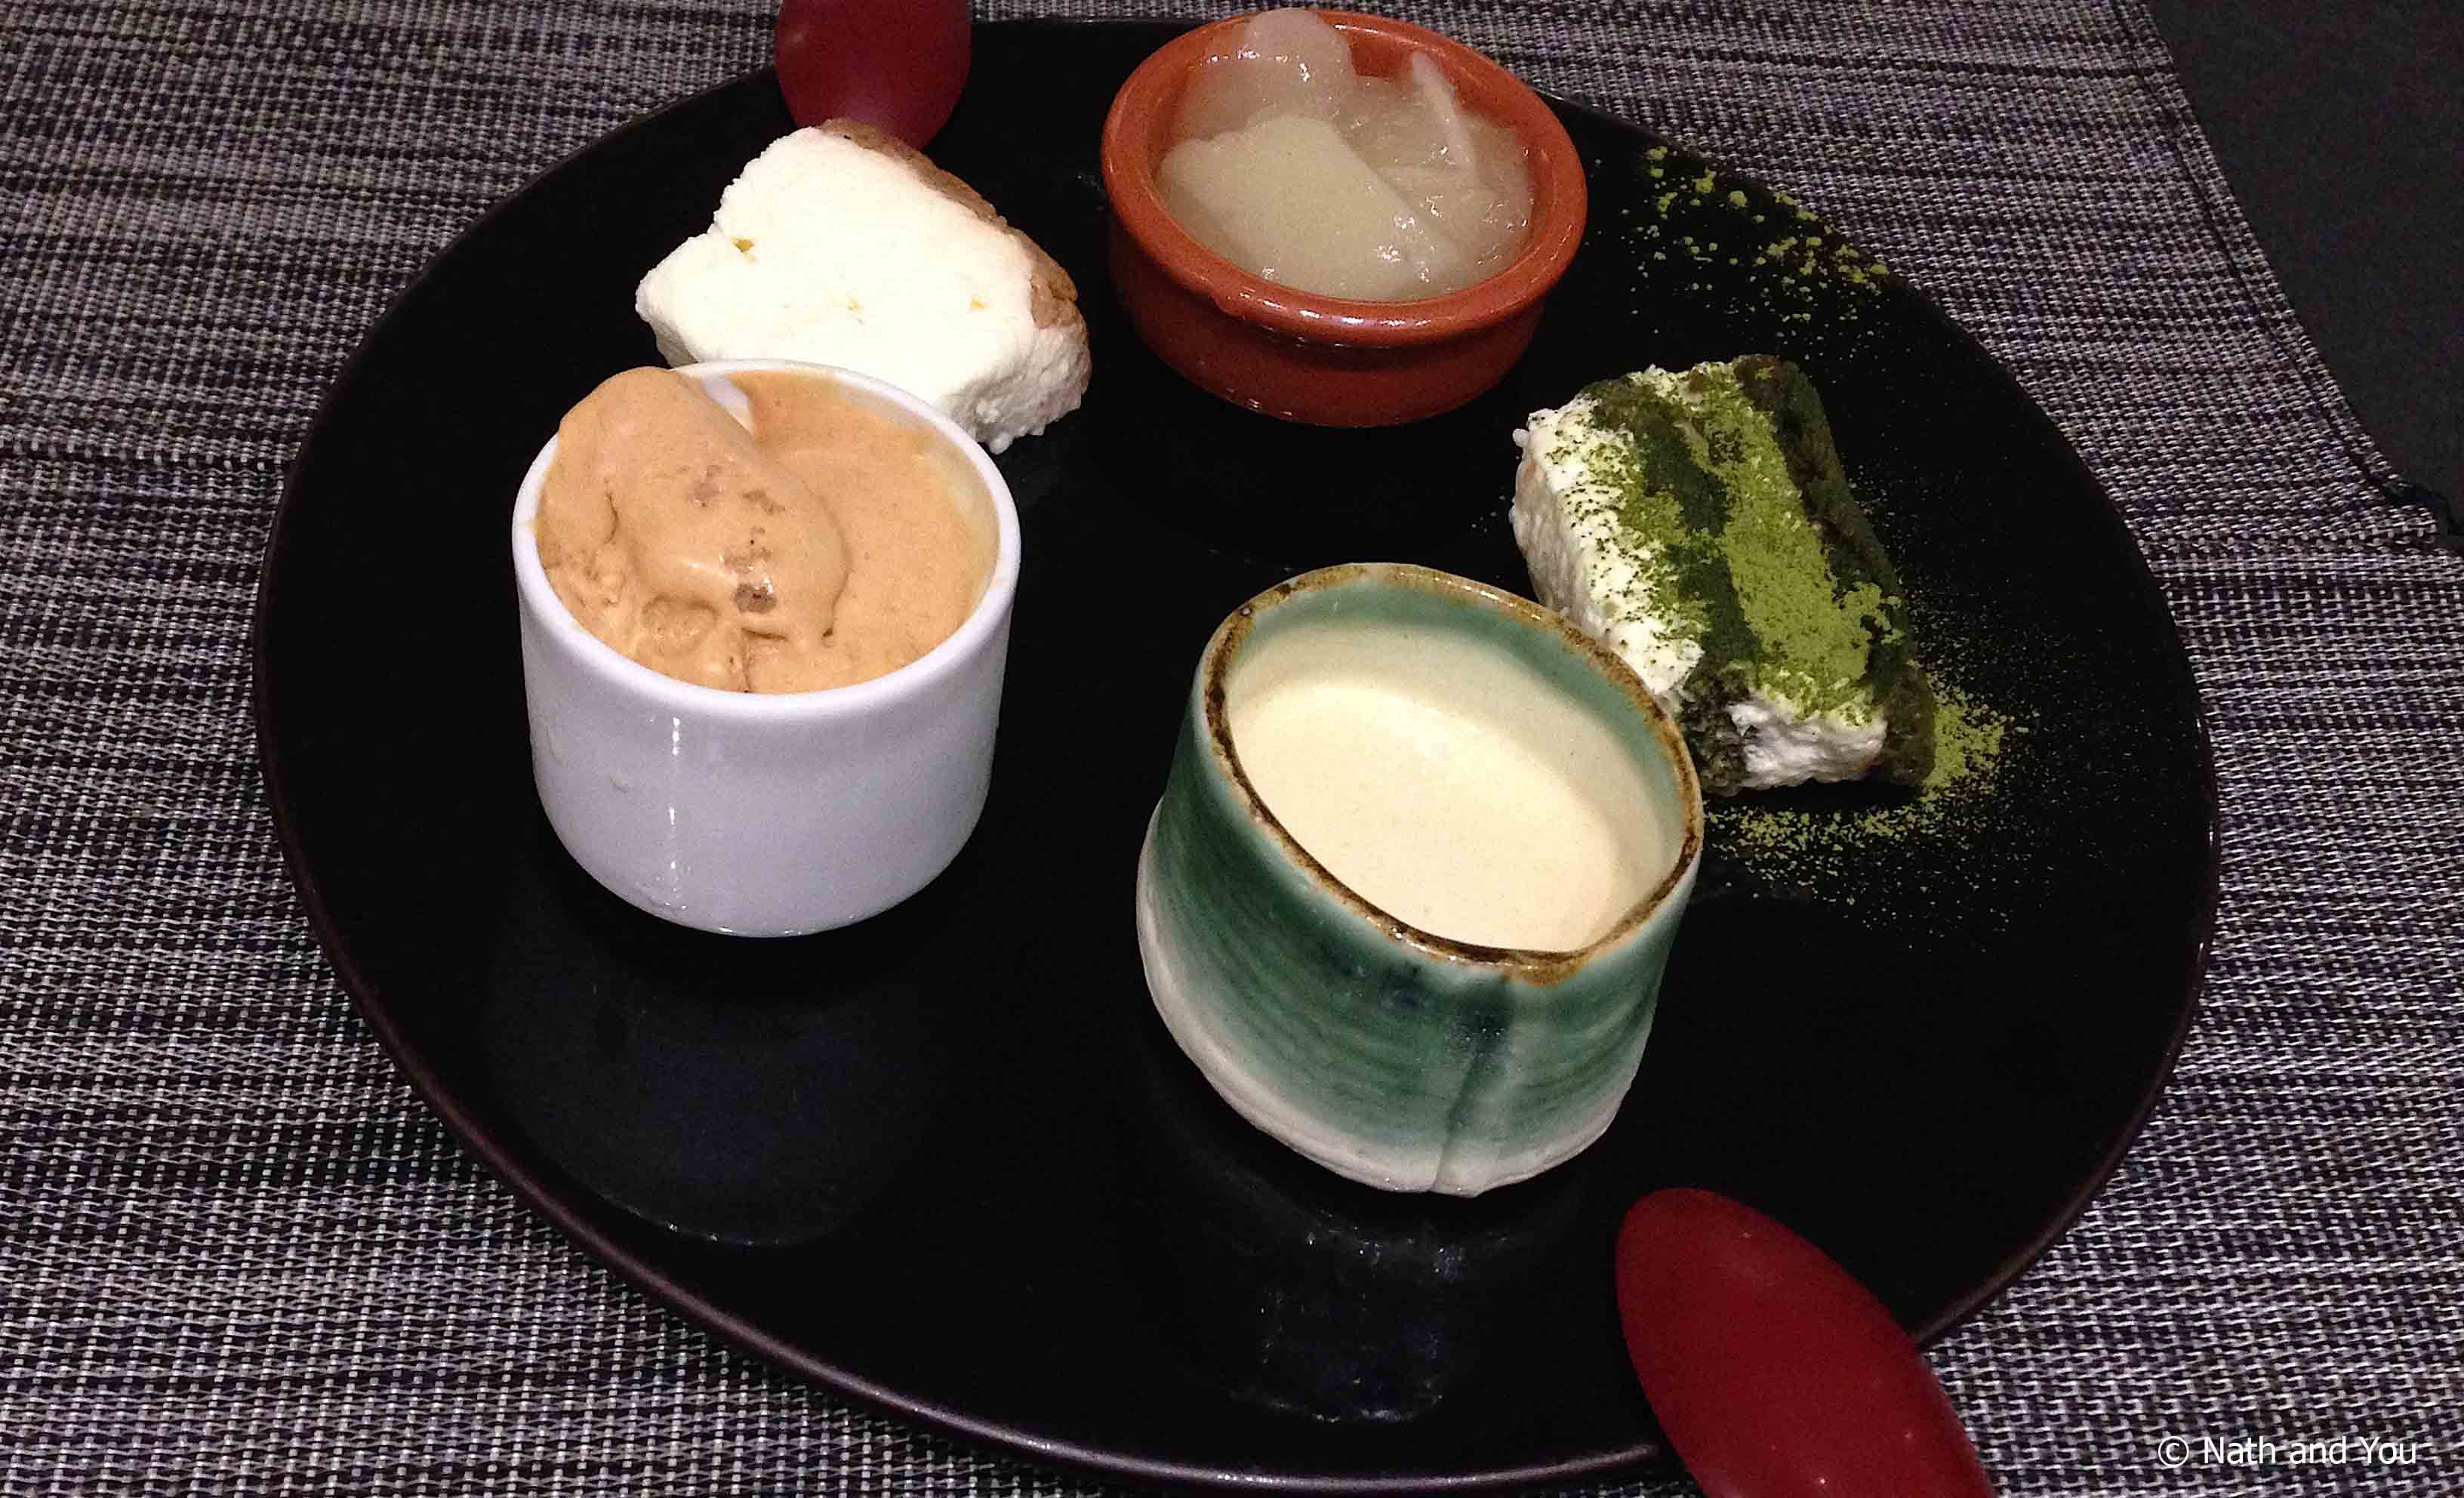 dessert-tiramisu-the-matcha-momoka-nath-and-you